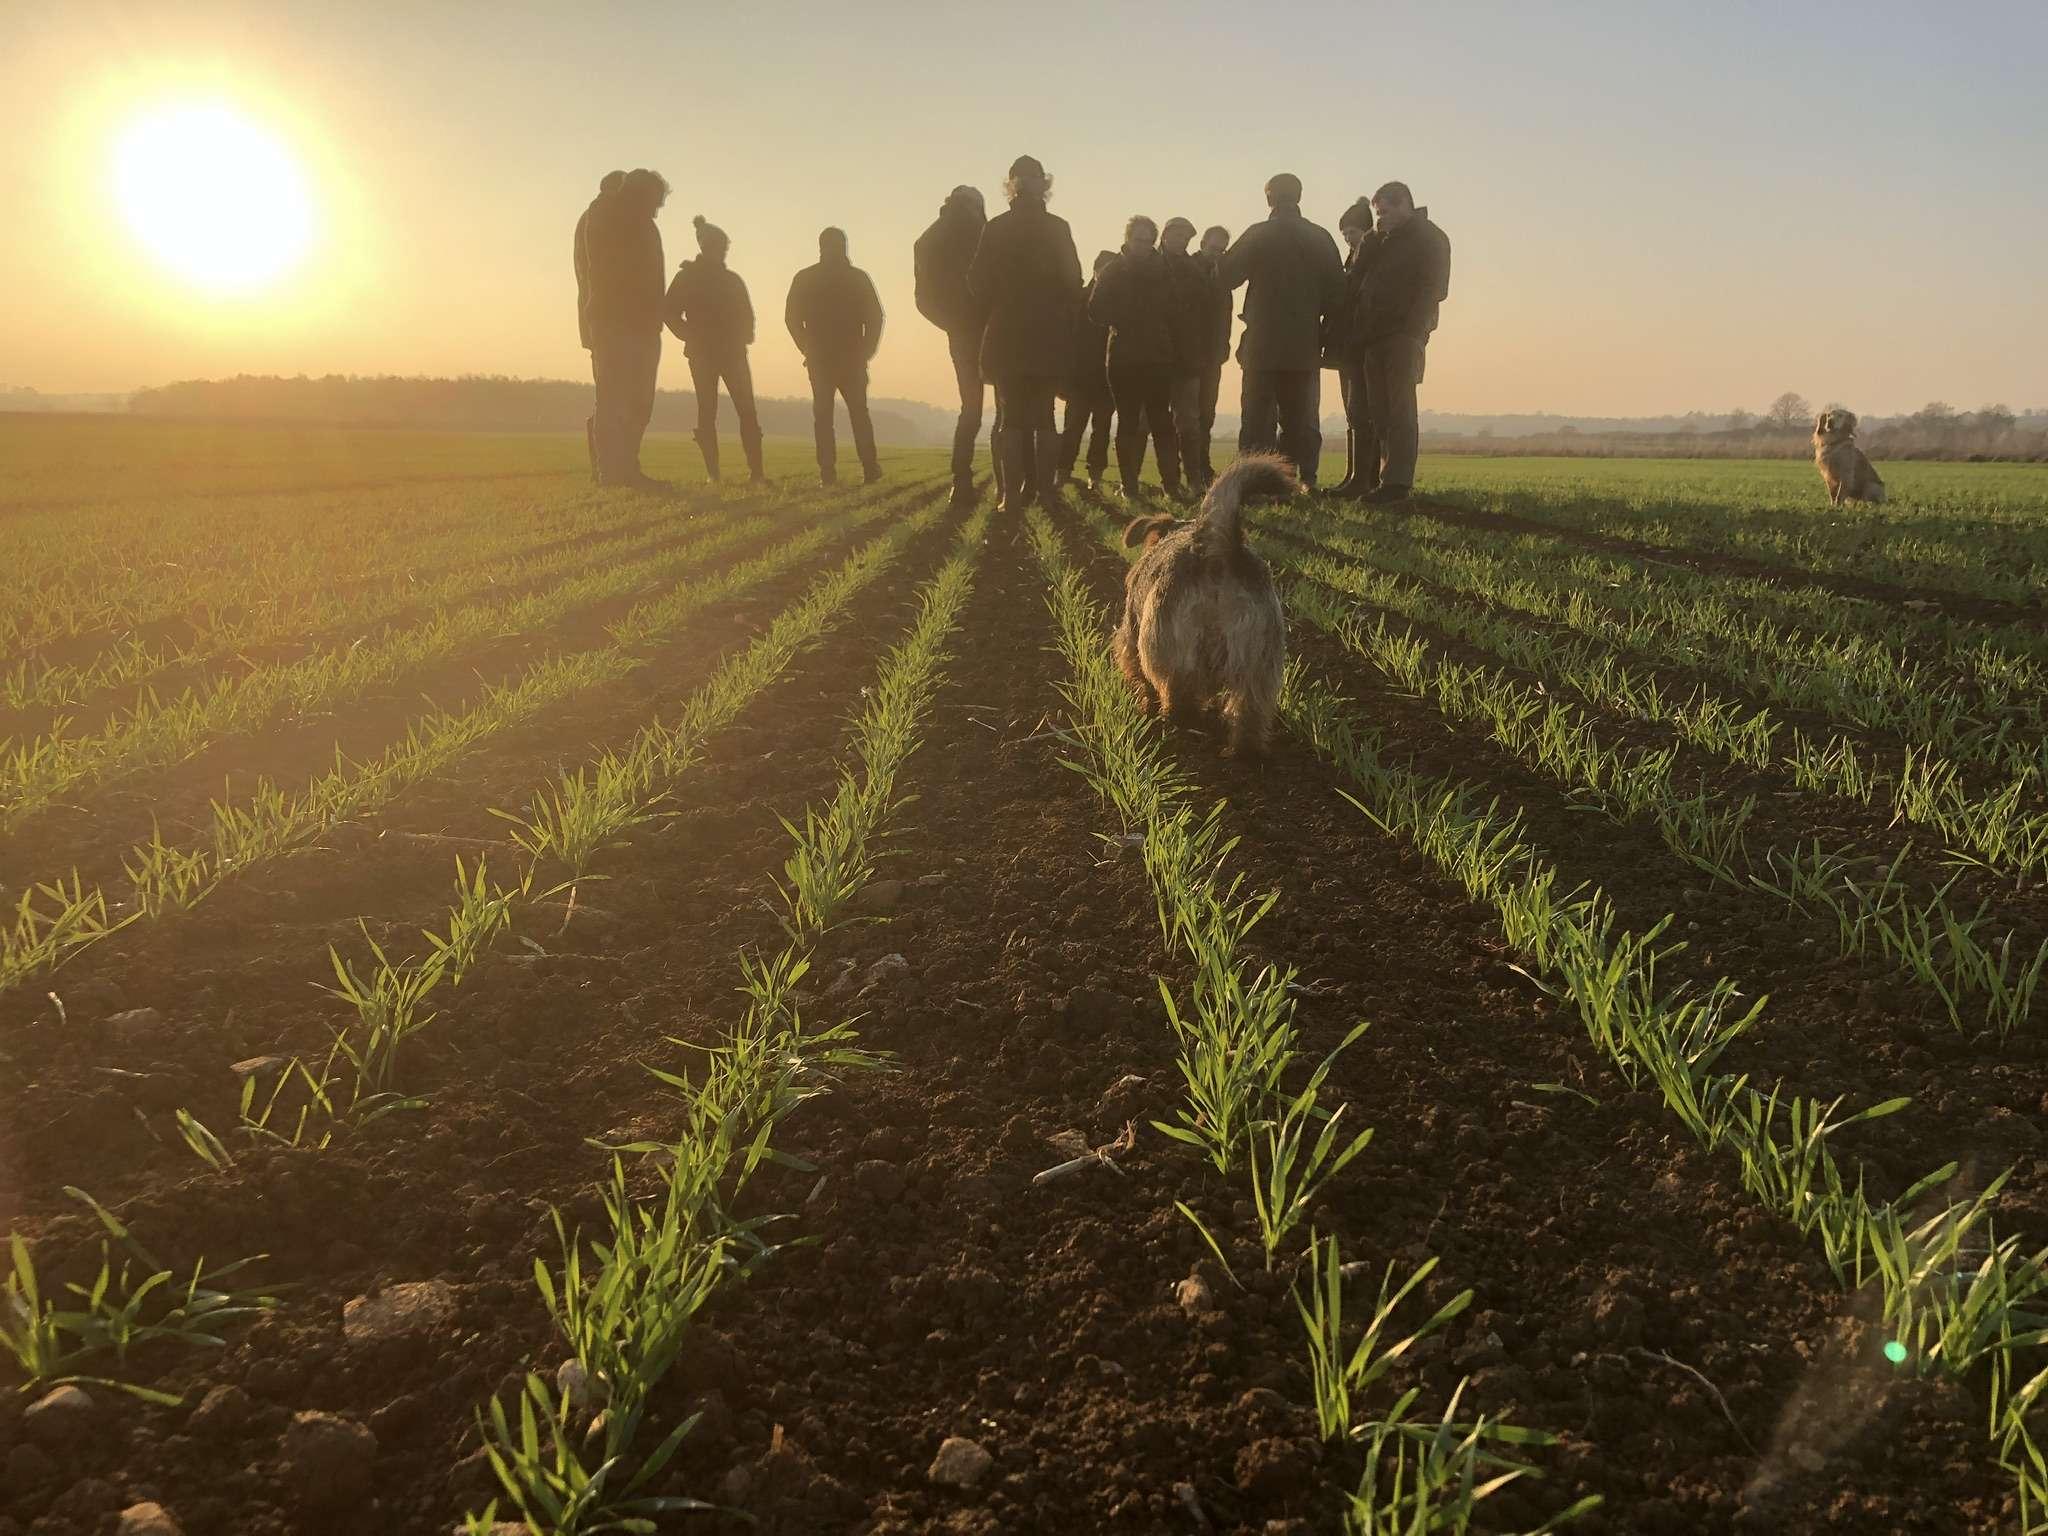 Farmers inspecting crops in a field